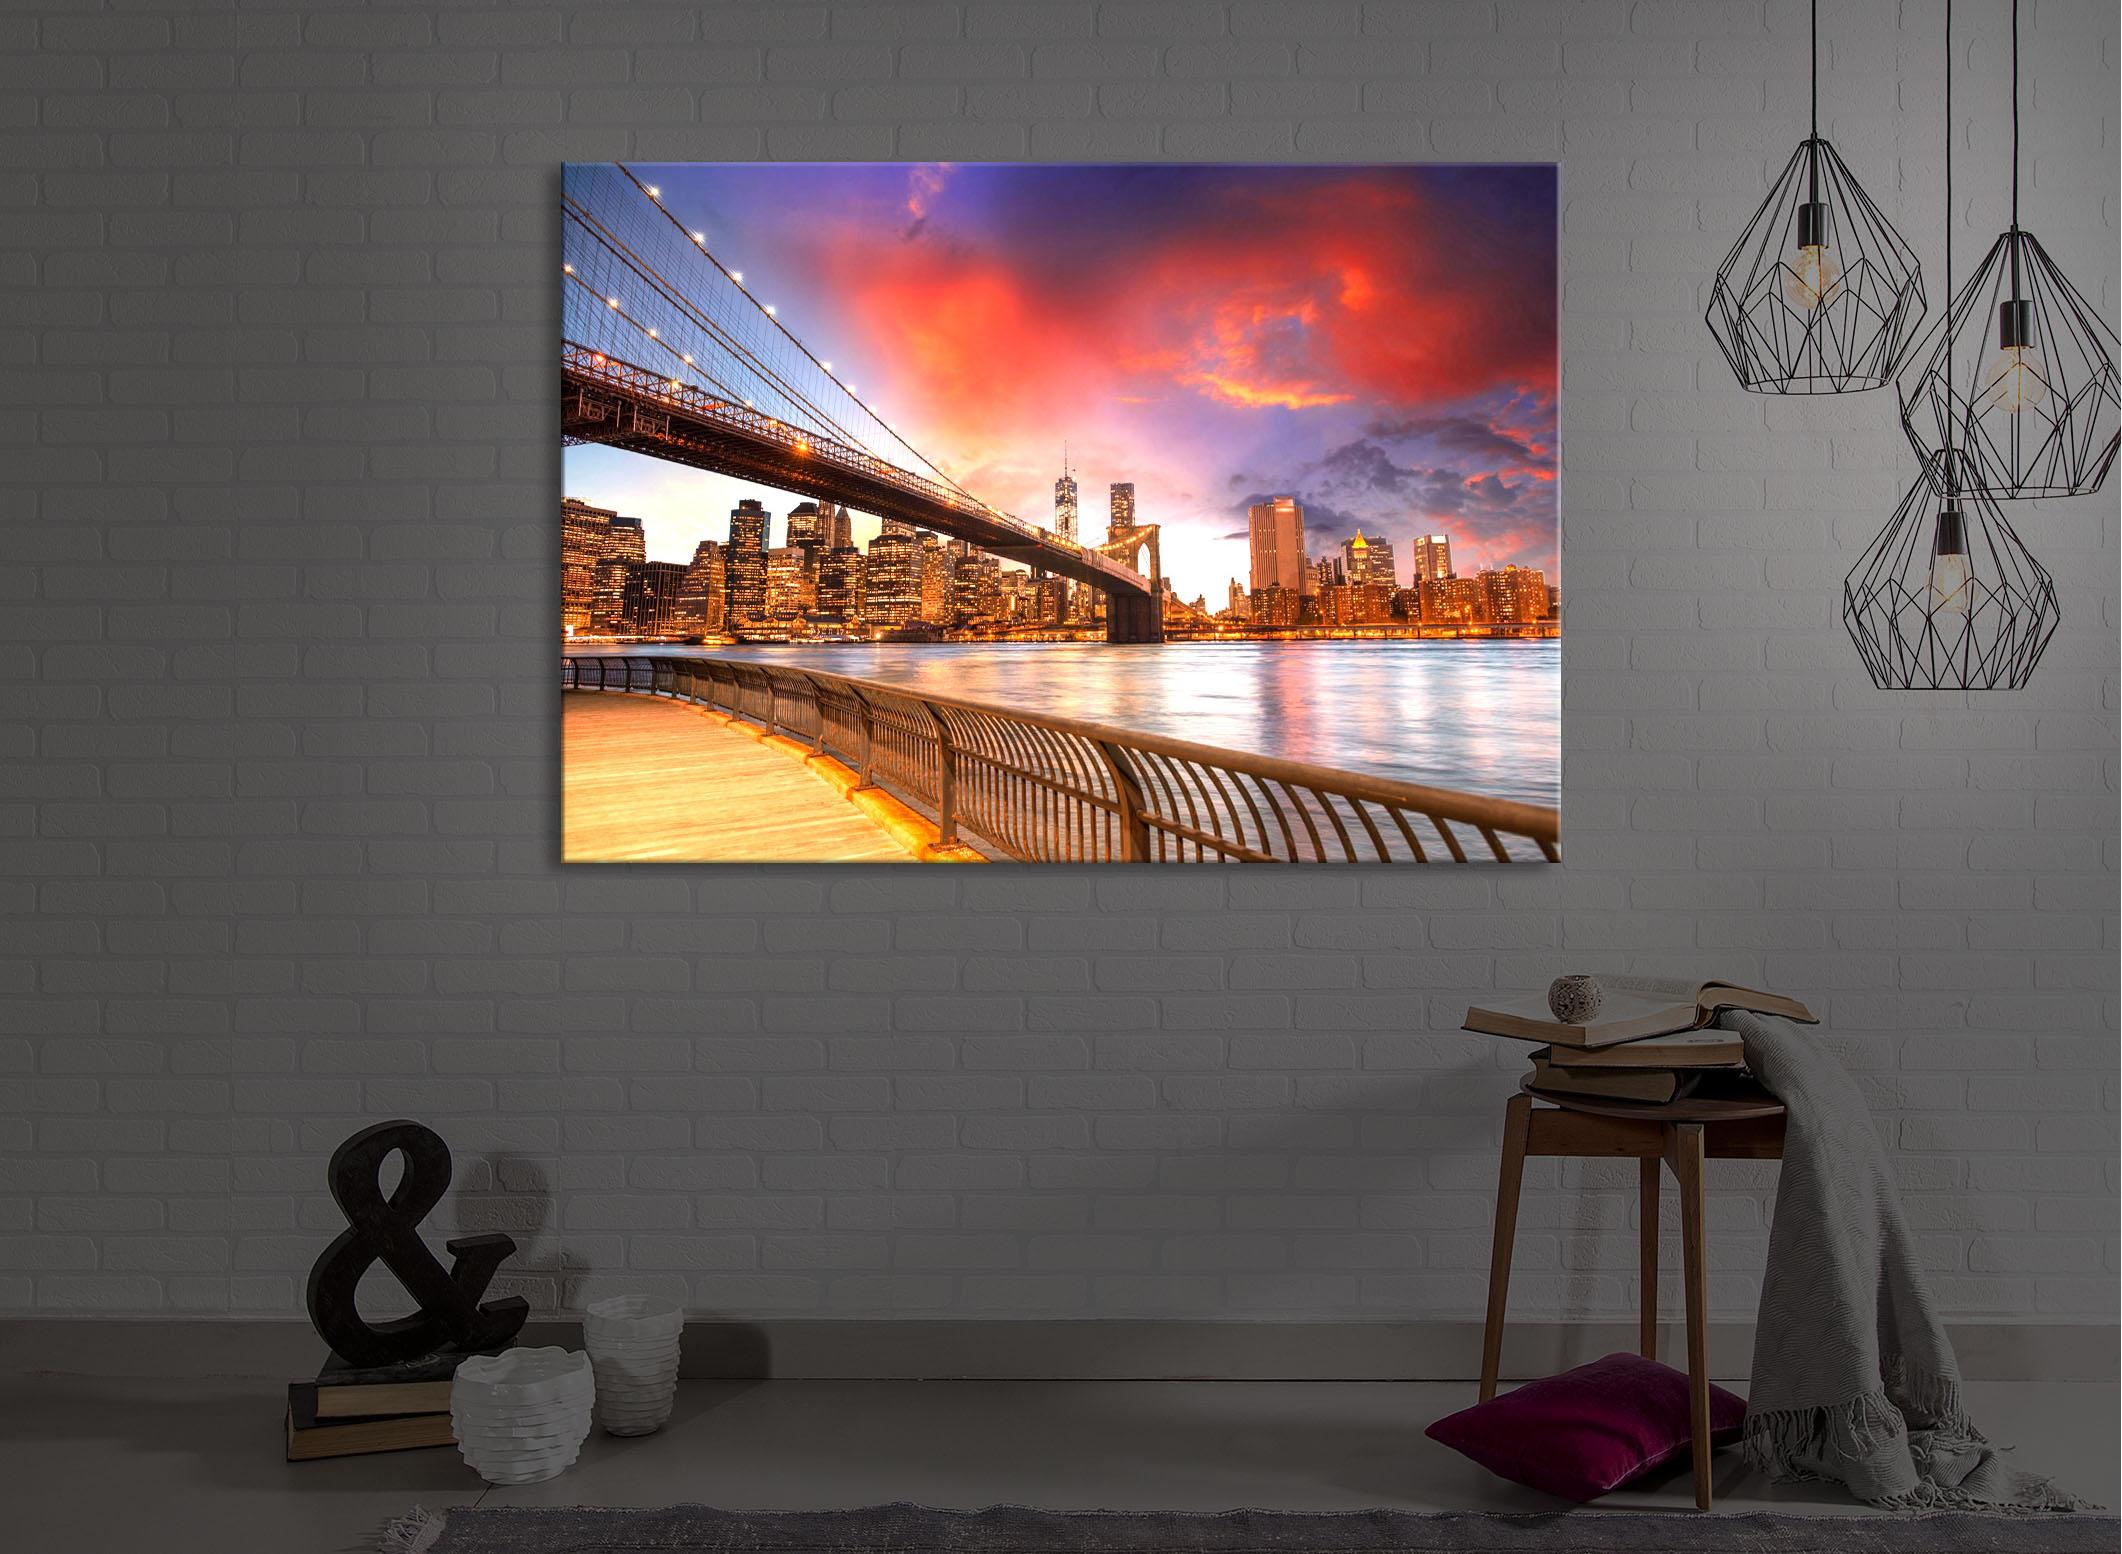 tableau illumin image led parc de brooklyn bridge new york fully lighted ebay. Black Bedroom Furniture Sets. Home Design Ideas